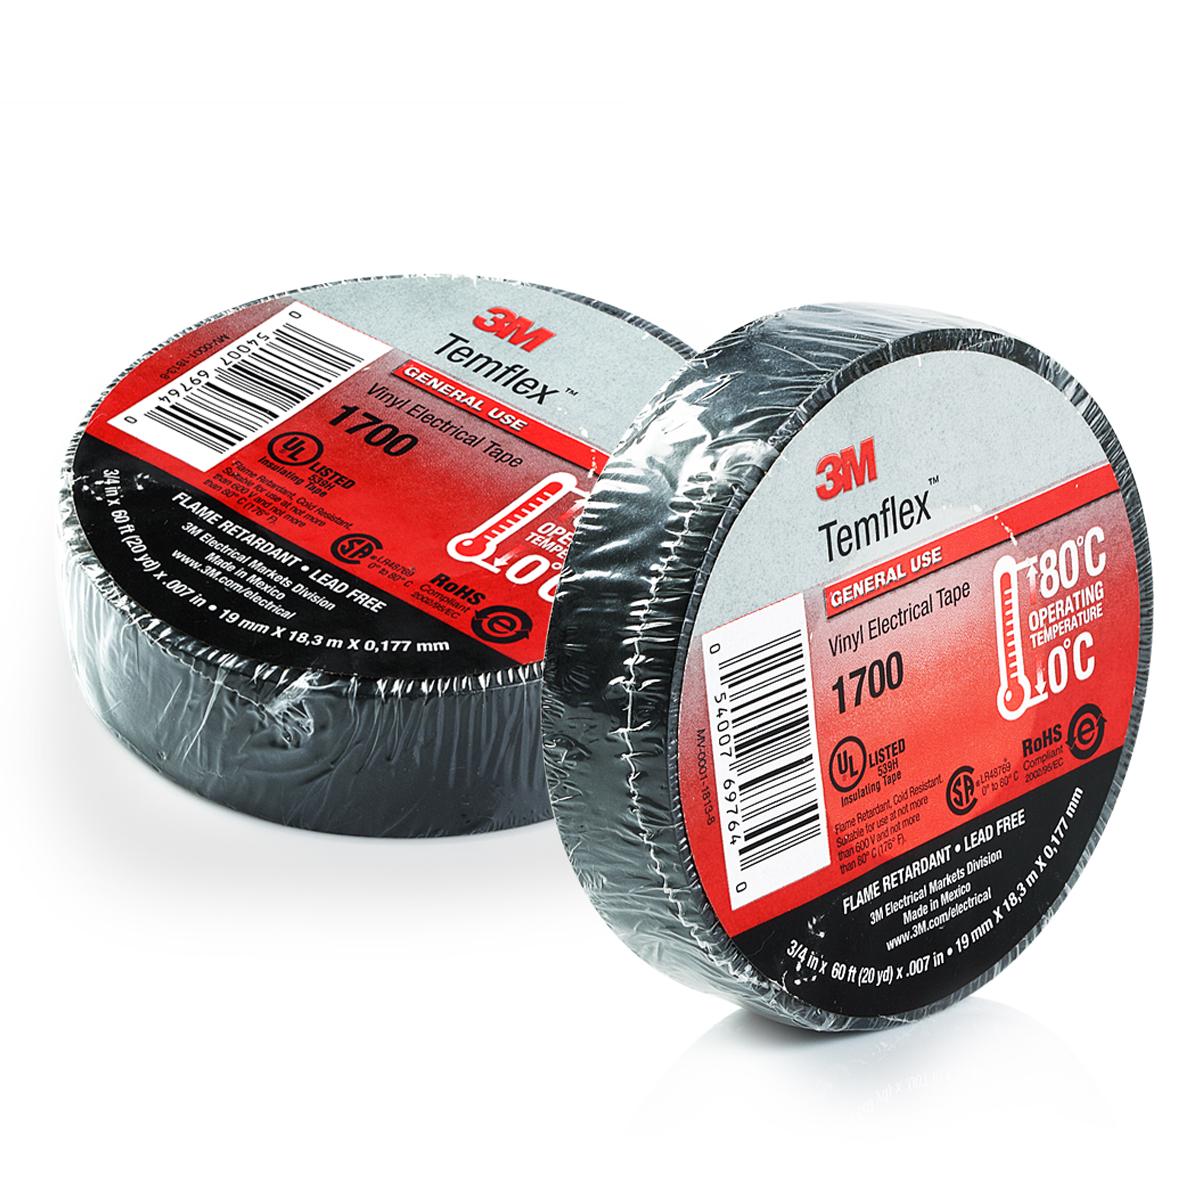 "PREMIUM 1700 3M TEMFLEX BLACK VINYL ELECTRICAL TAPE 3//4/"" X 60/' FLAME RETARDANT"